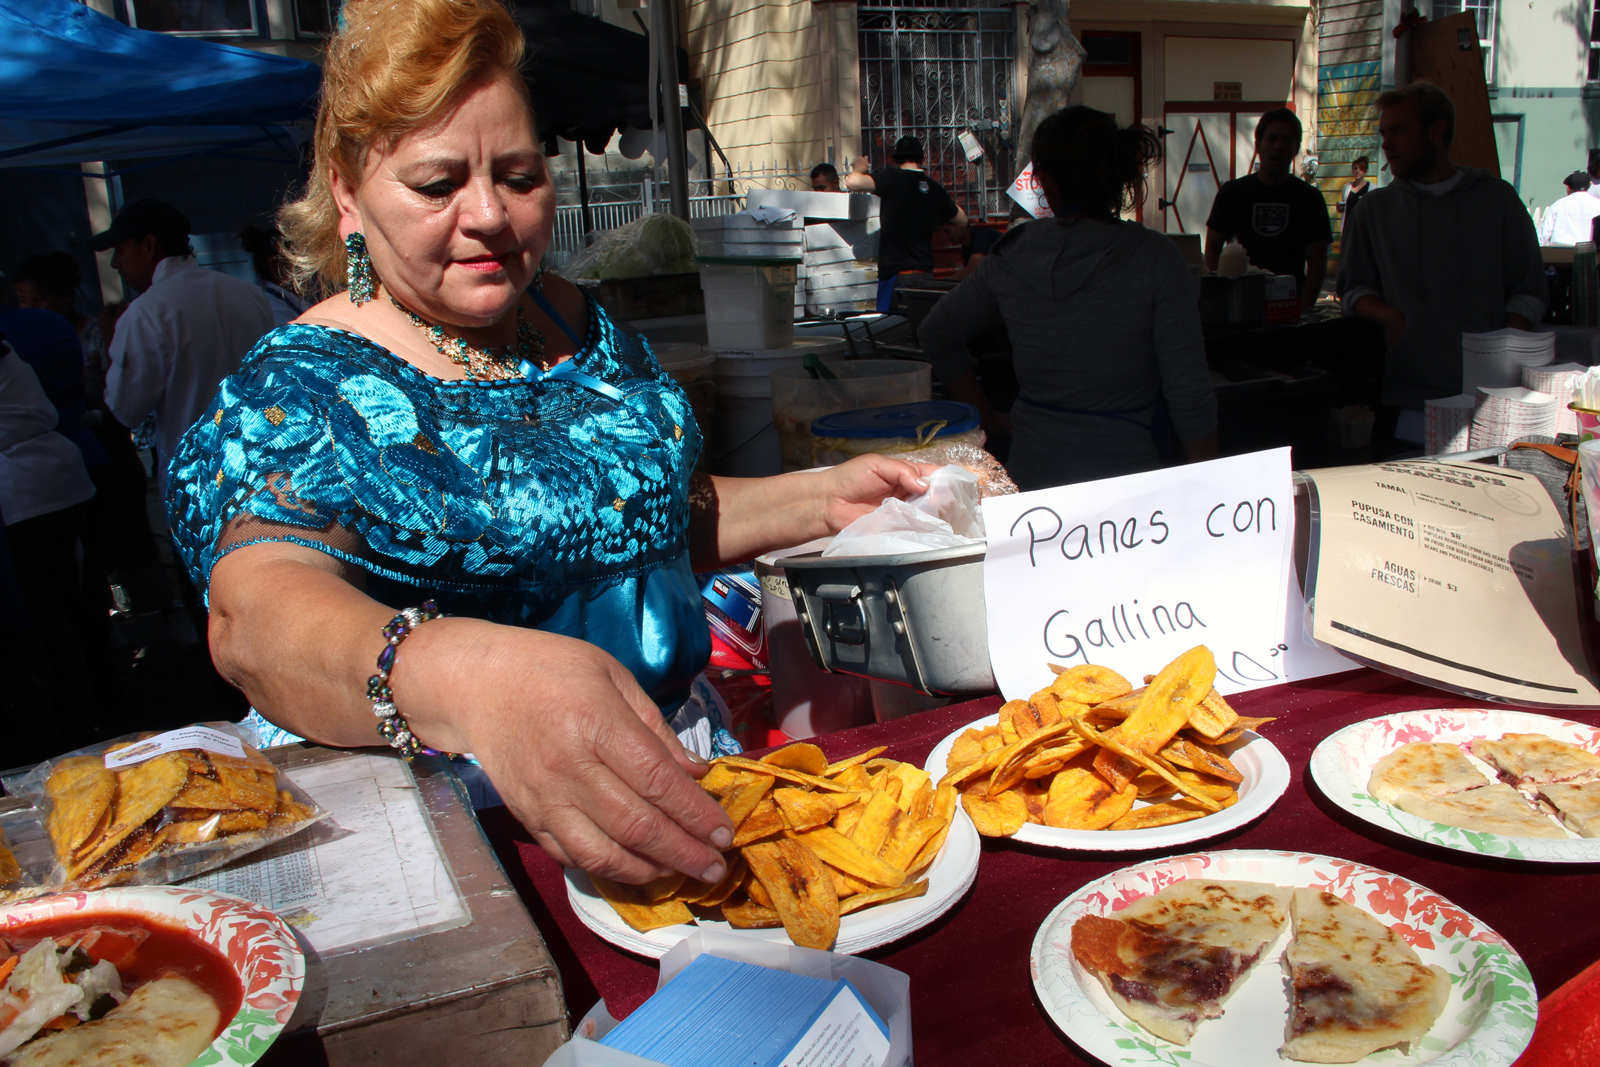 Street Food Festival: The Vendors